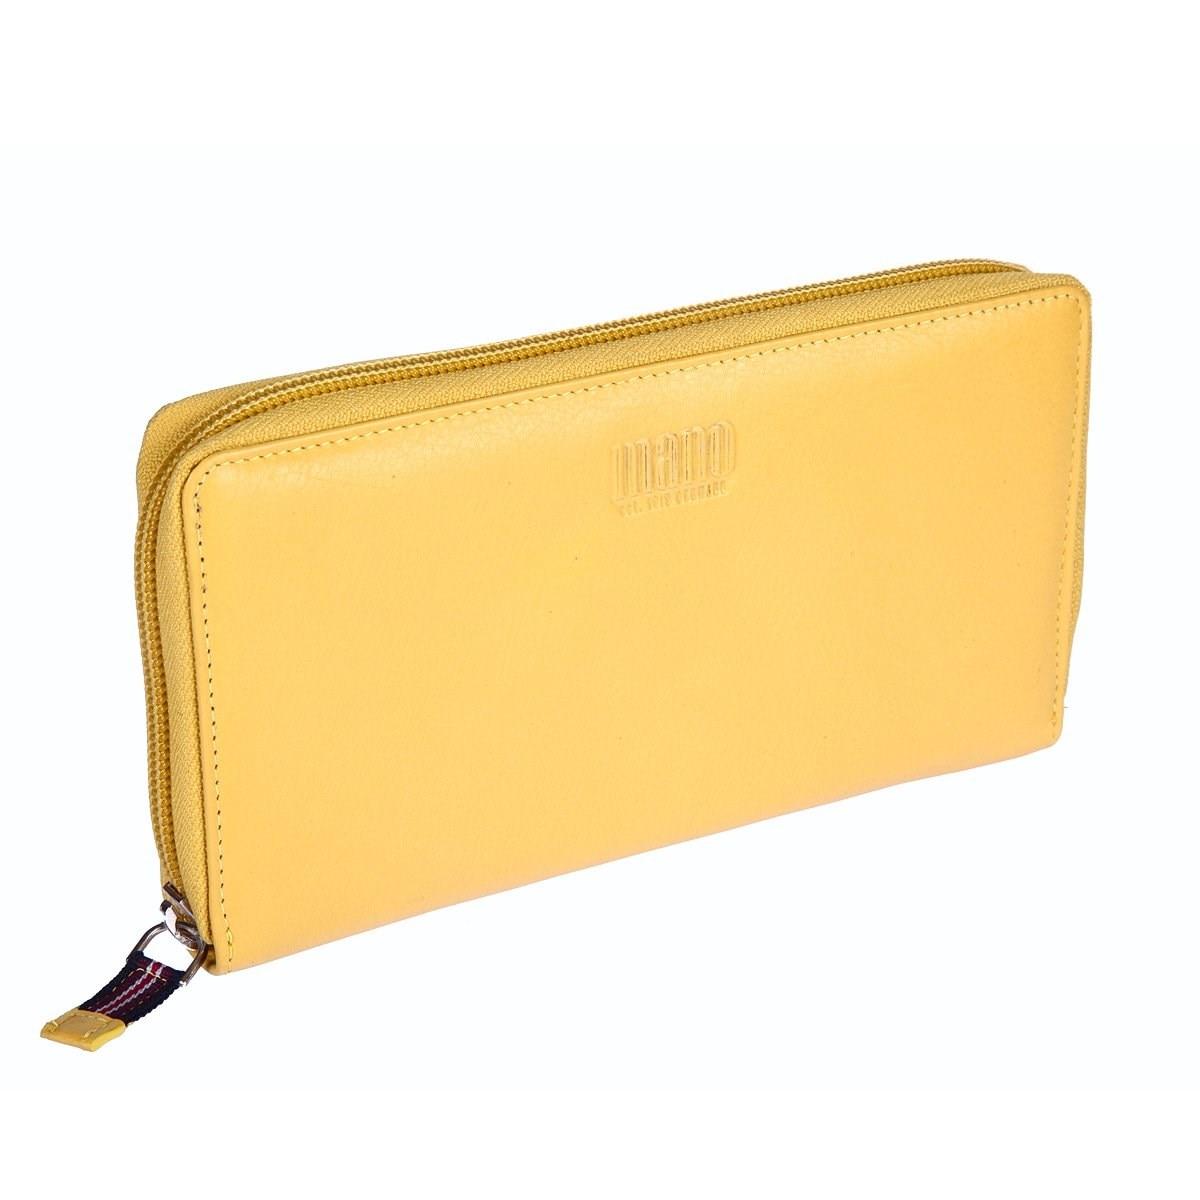 Purse Mano 20102 SETRU yellow кошельки бумажники и портмоне mano 20103 setru black